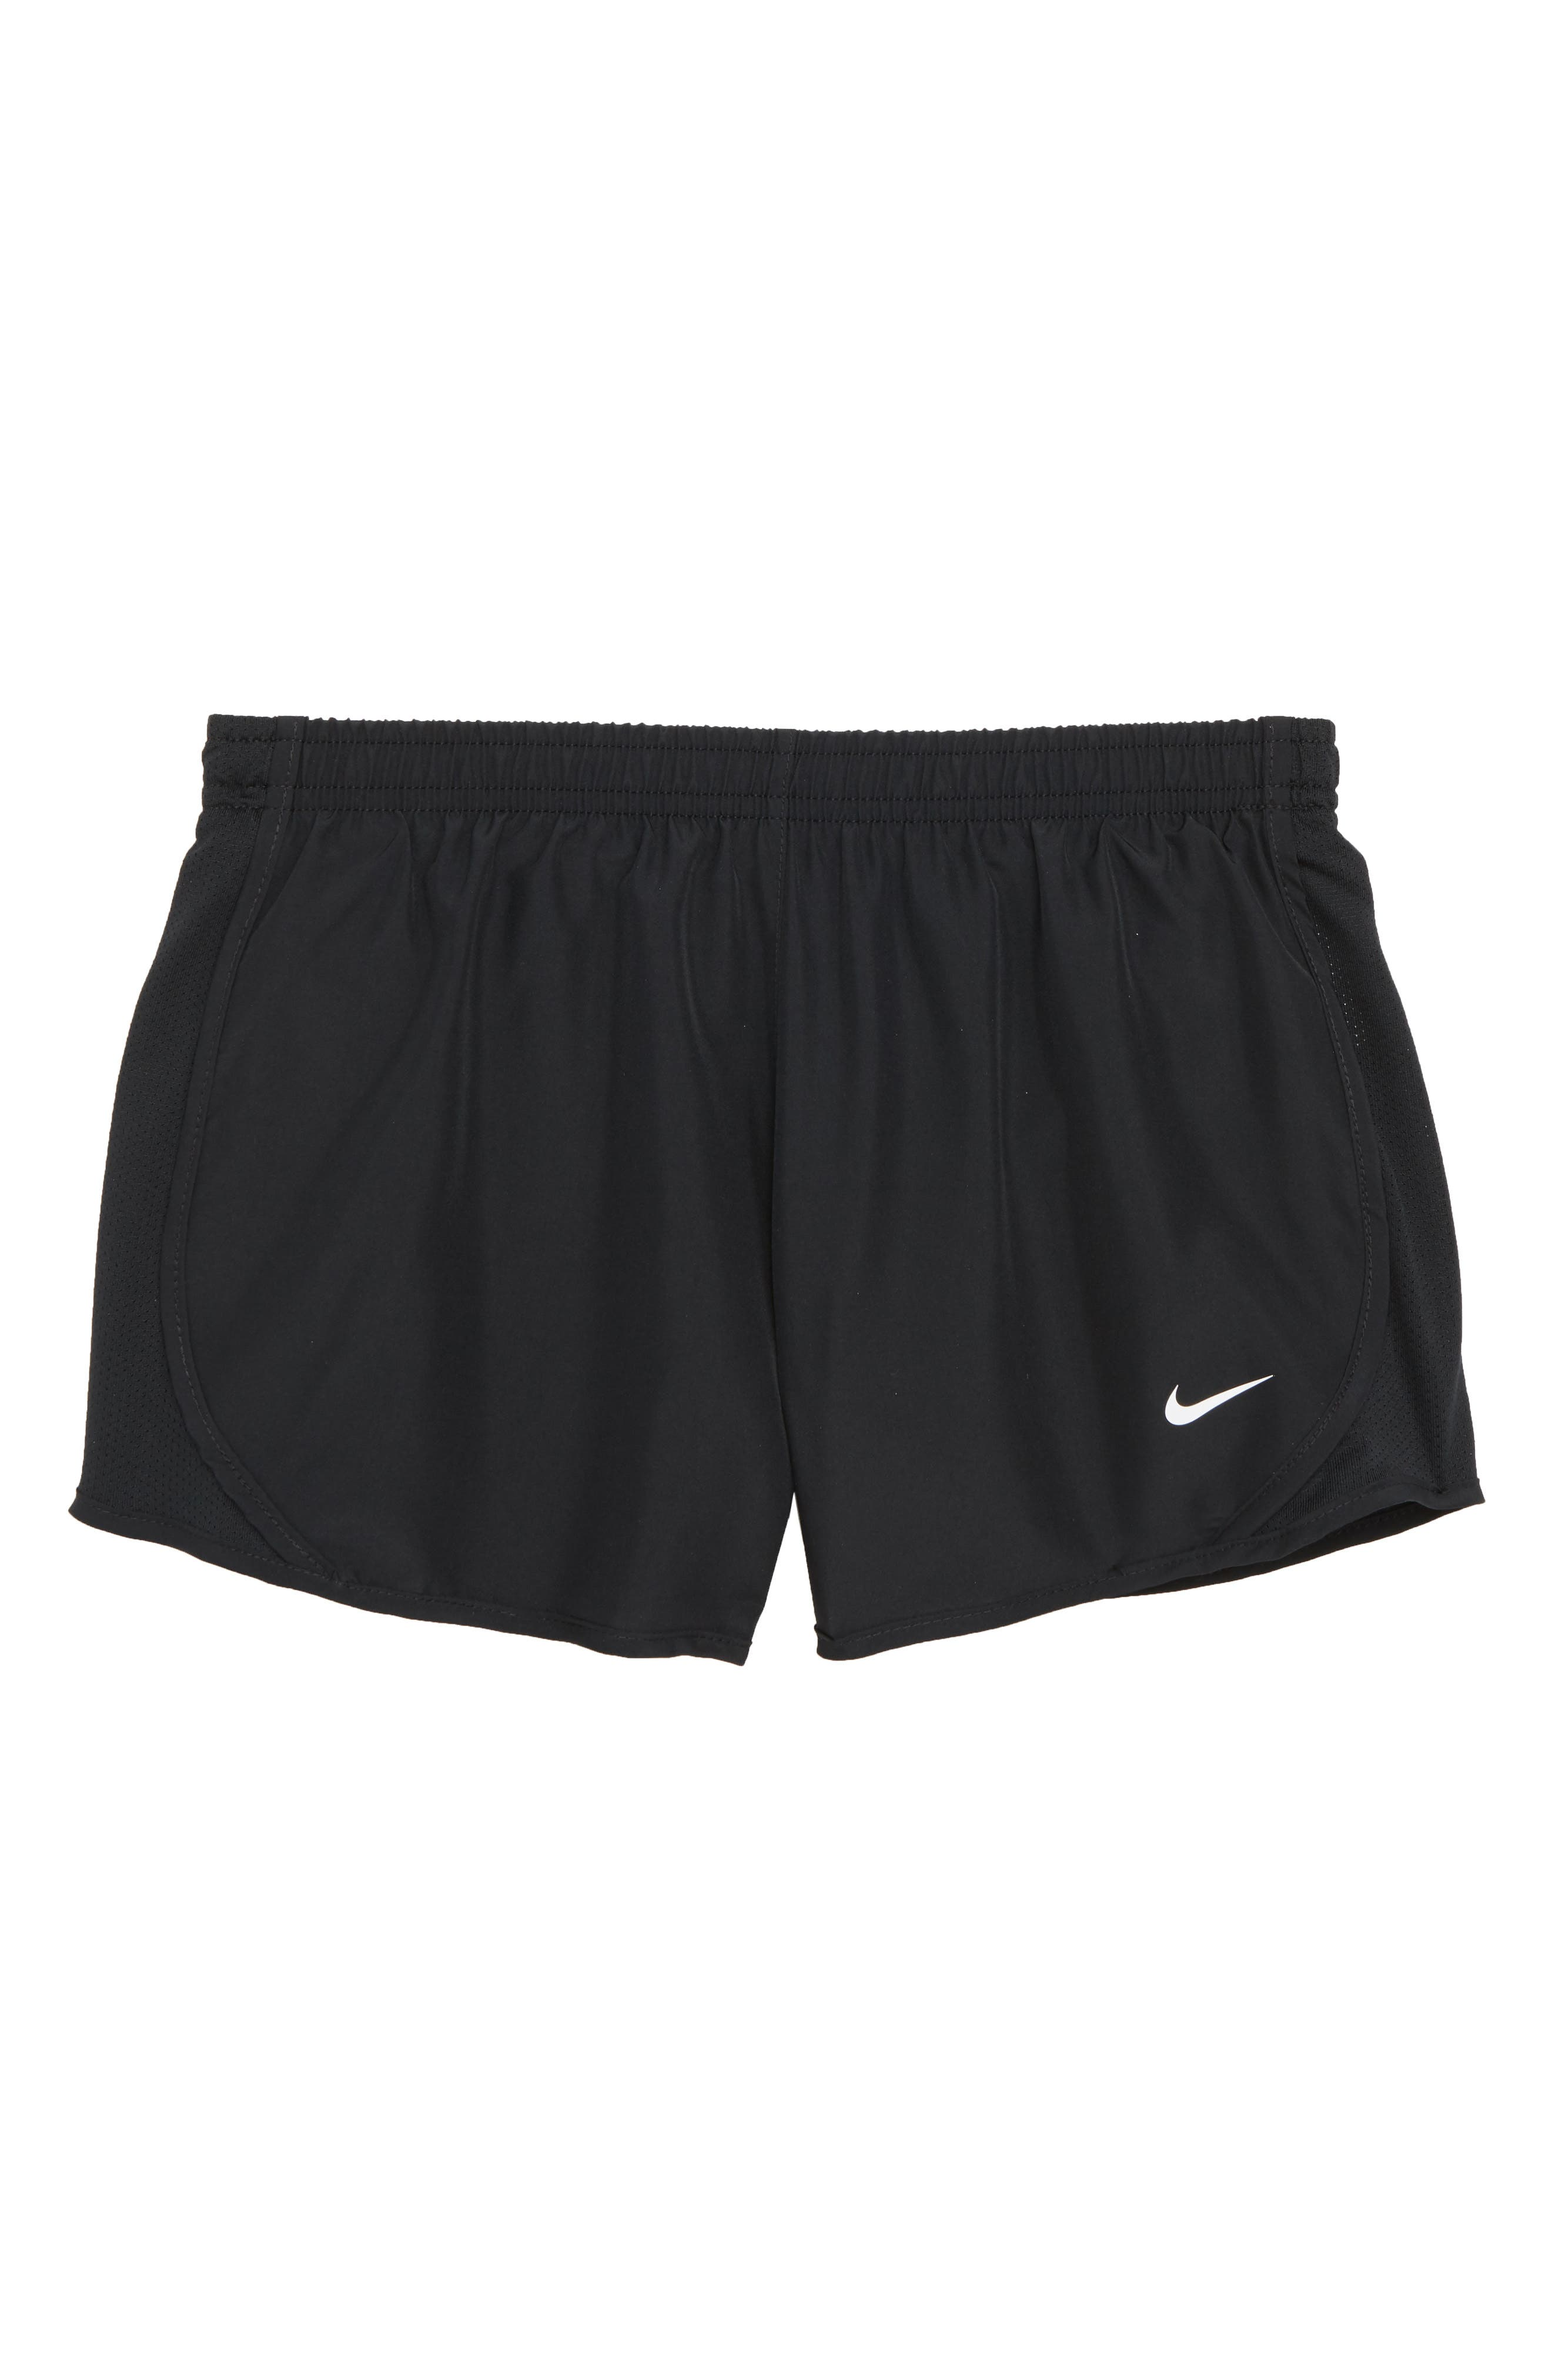 Dry Tempo Running Shorts,                         Main,                         color, Black/ Black/ Black/ White